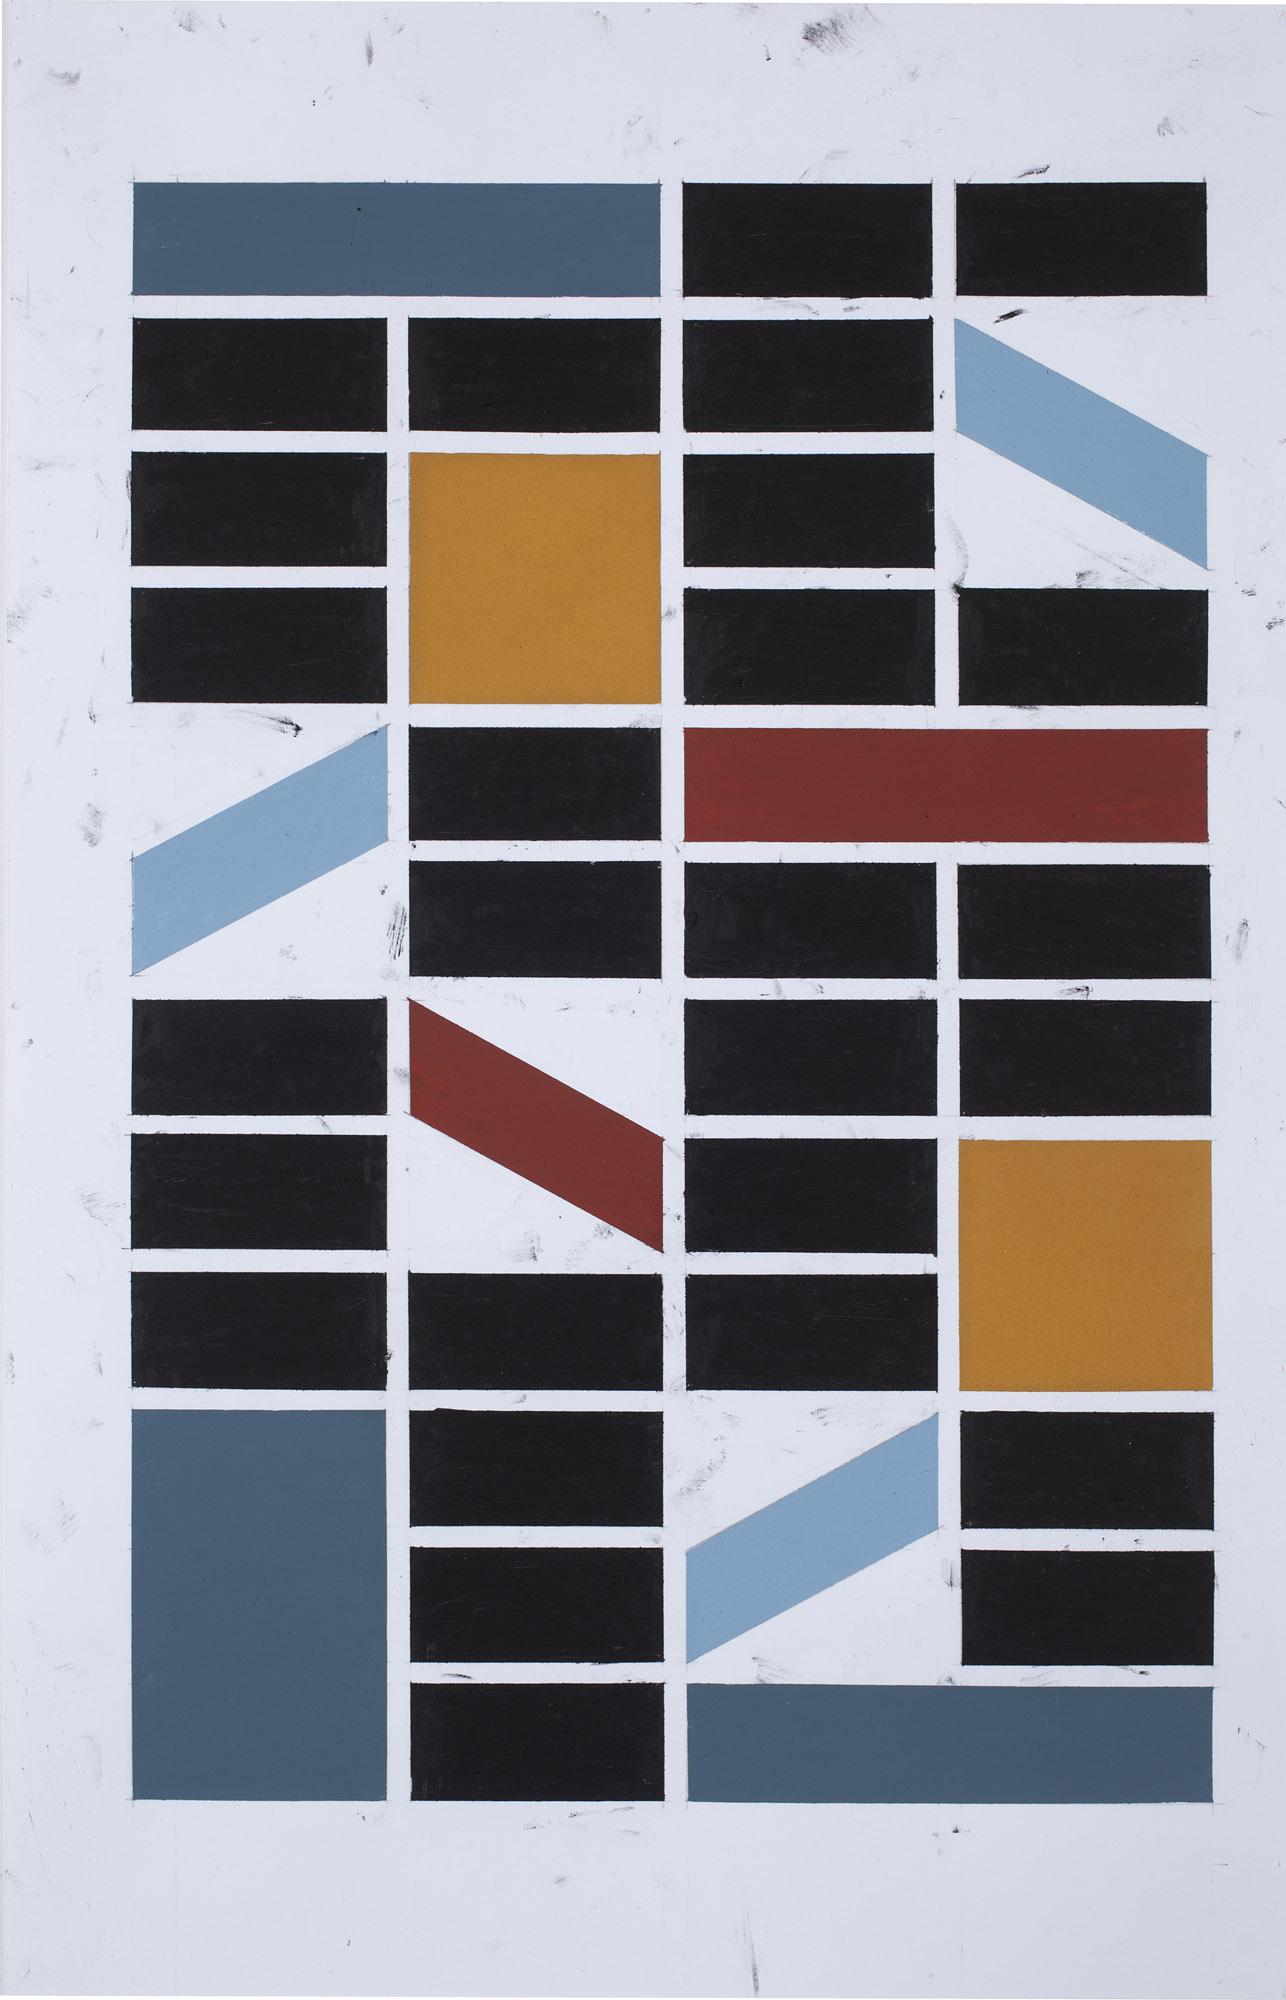 35,5x25,5 cm Blyant, oljepastell, gouache 2016